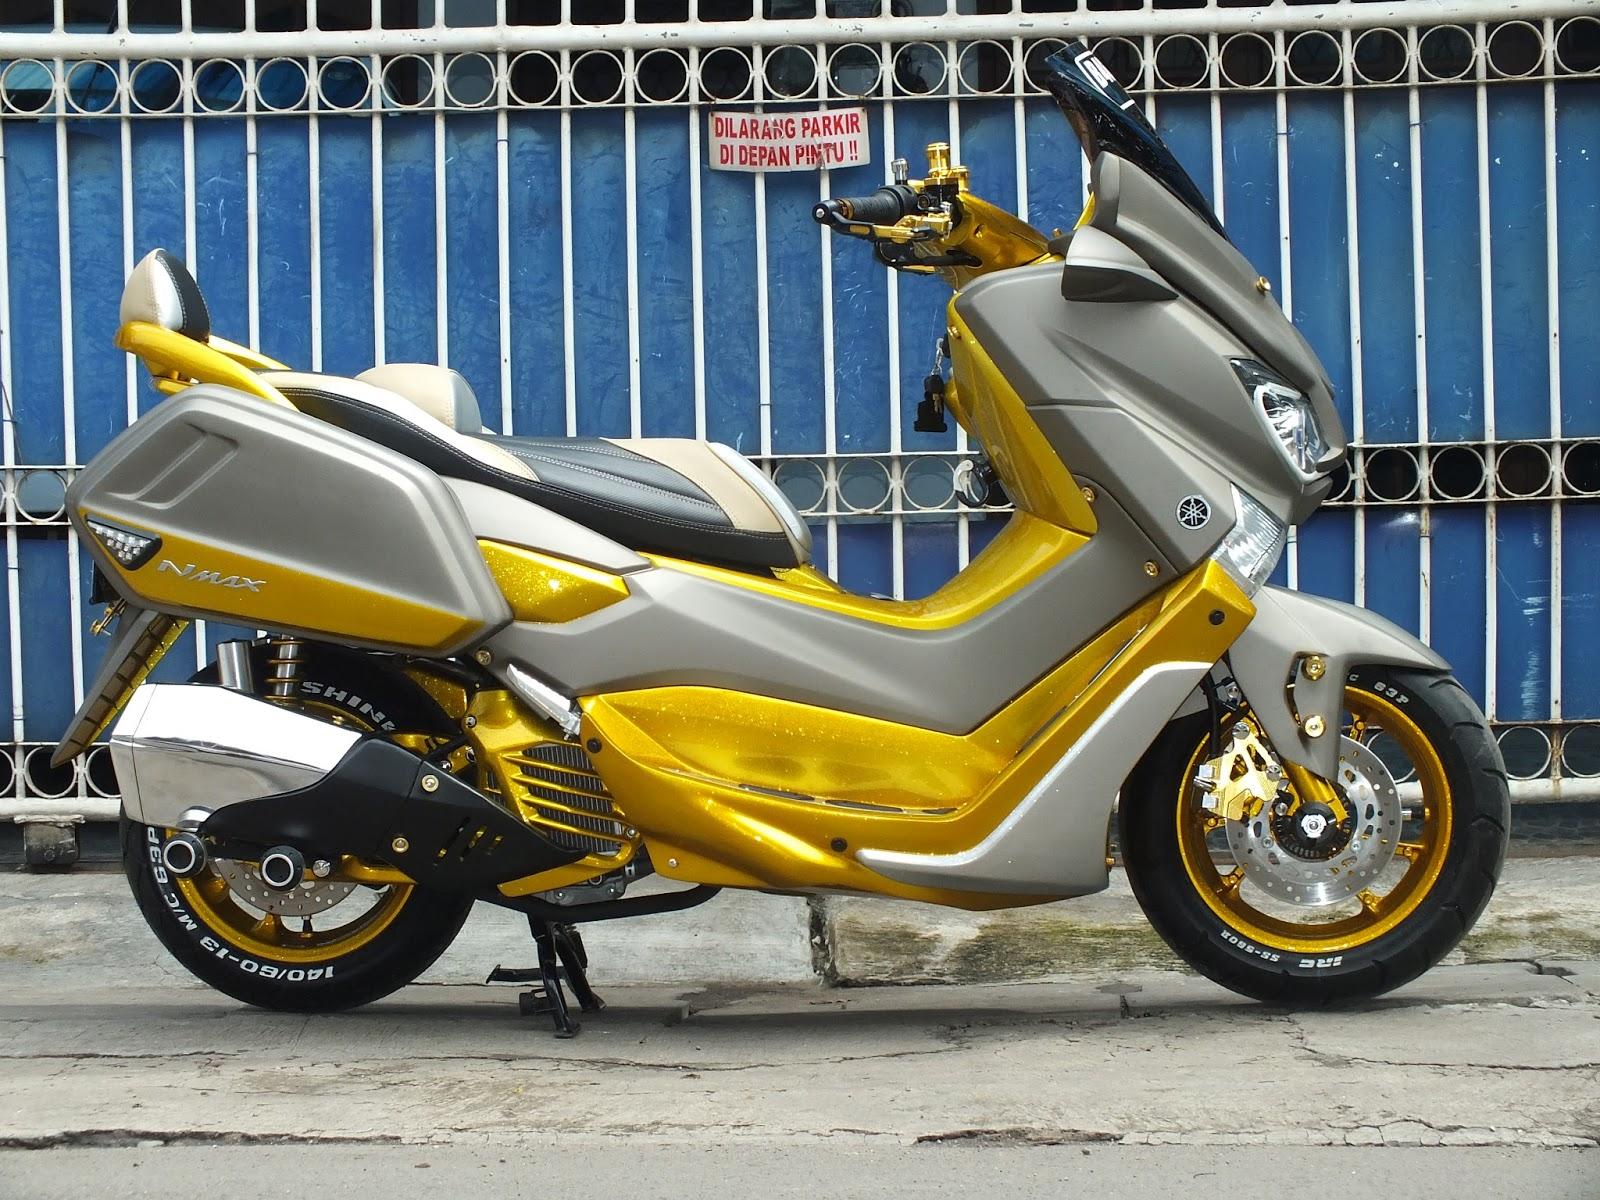 Doctor Matic Klinik Spesialis Motor Matic  Modifikasi Yamaha Nmax